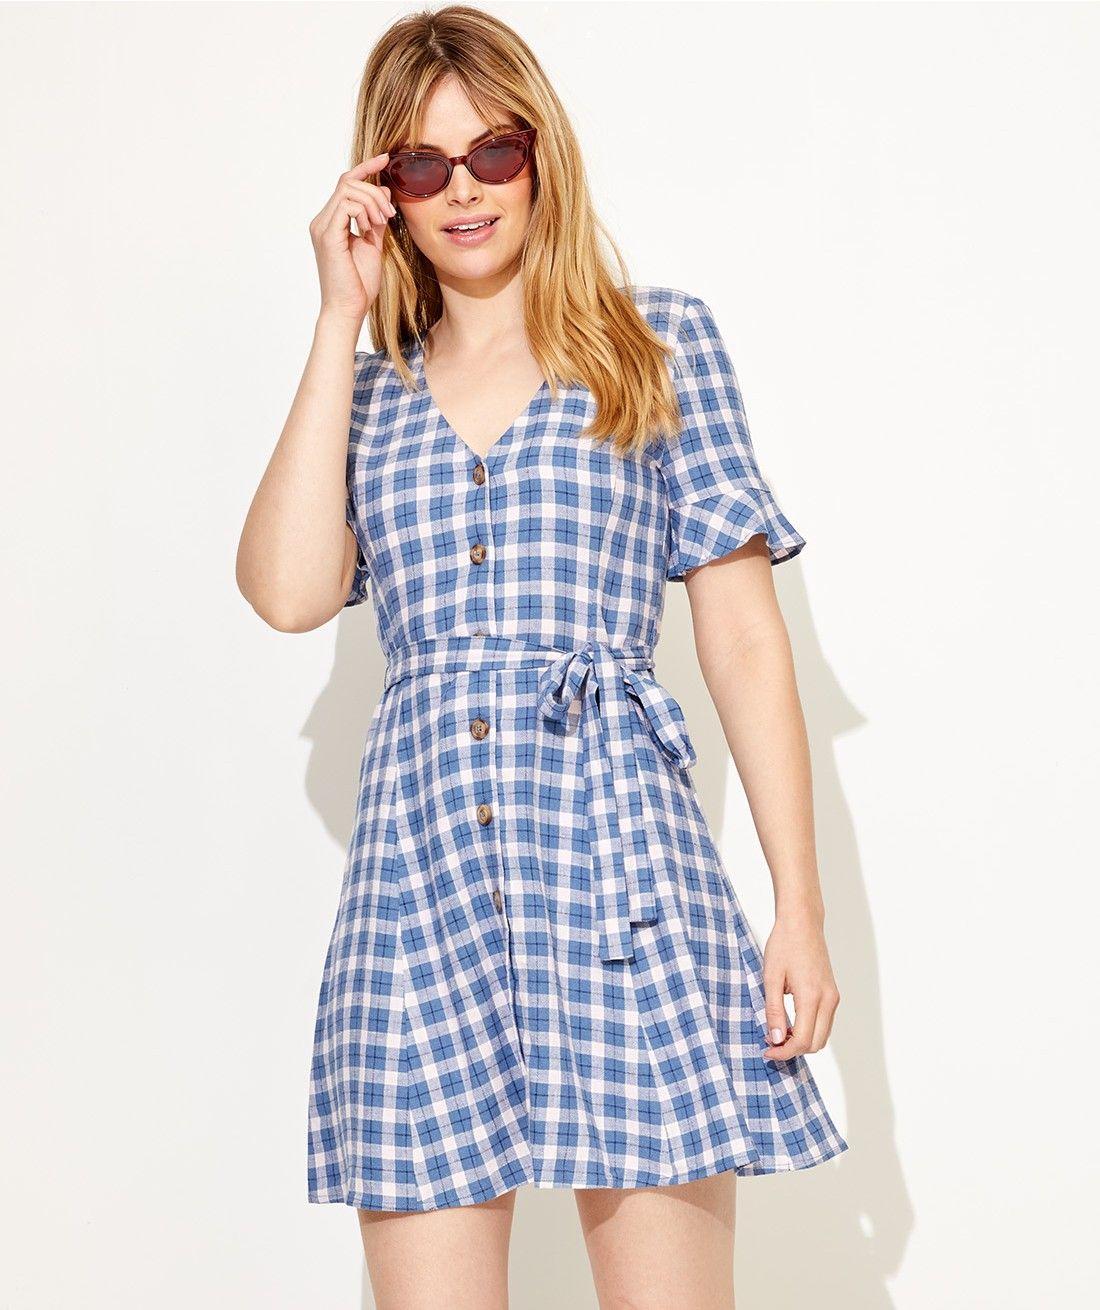 96eebaf9288 Linen Edit - Check Mini Linen Tea Dress - Clothing - Sportsgirl ...